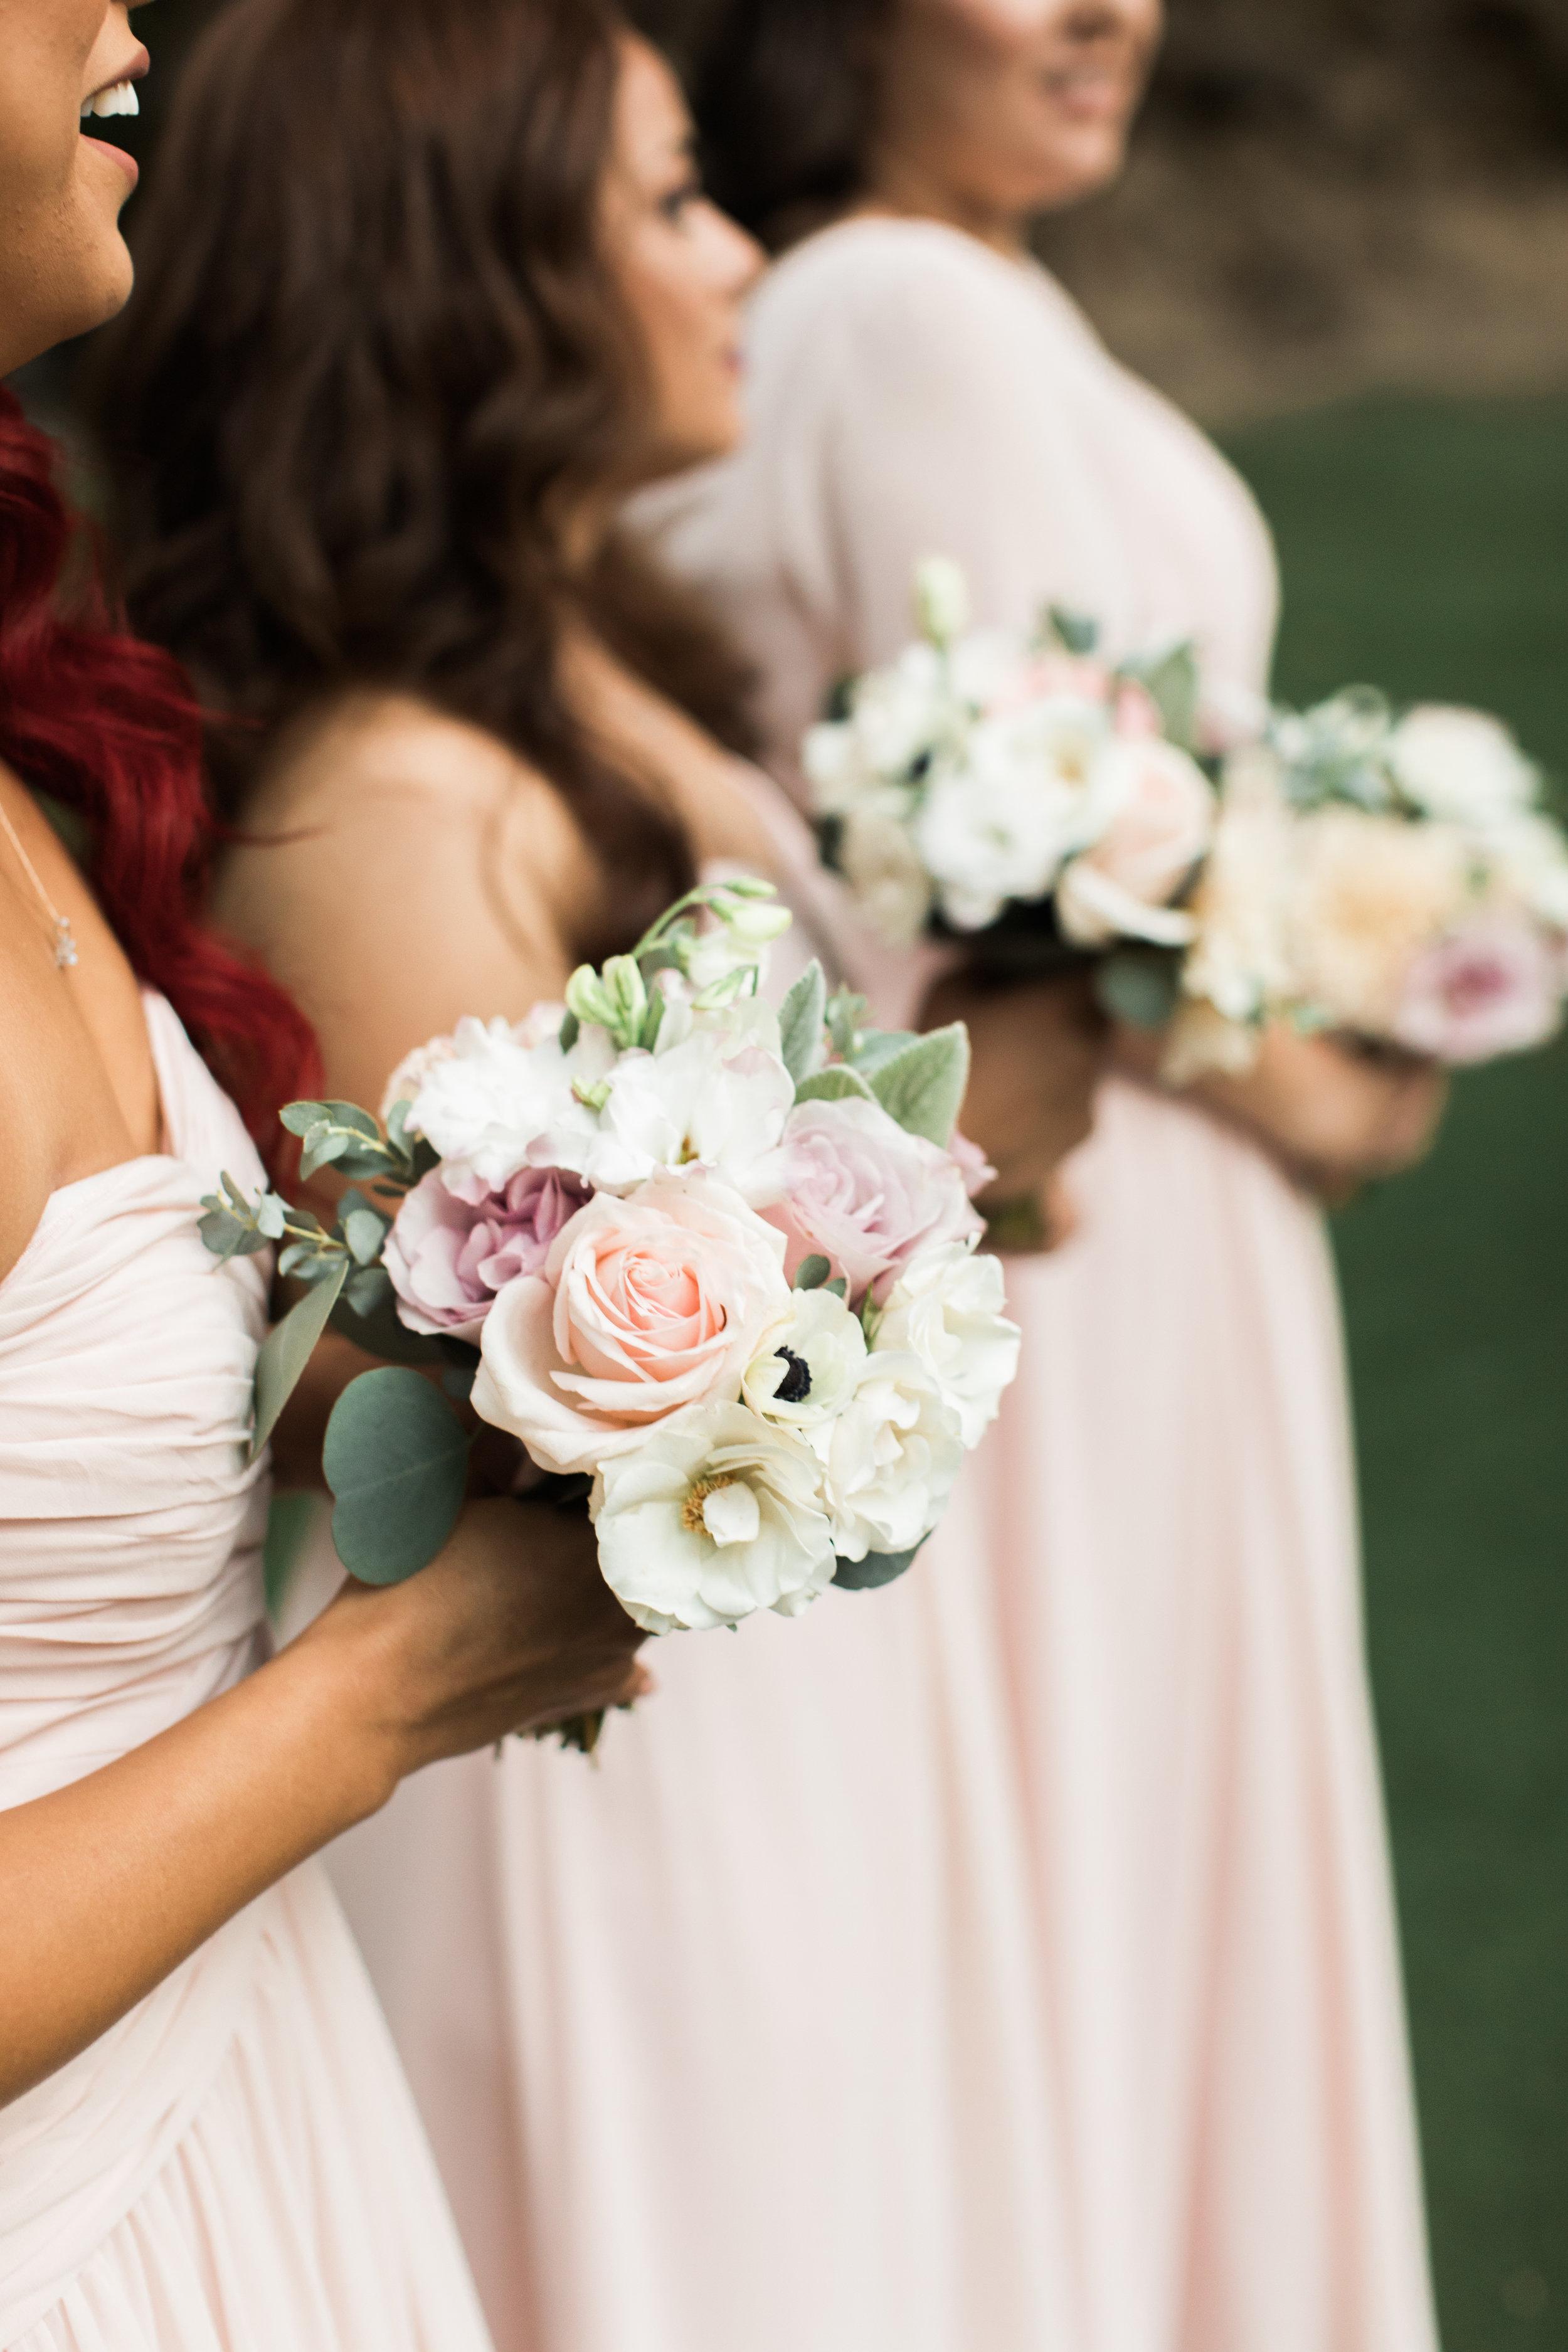 blush-bridesmaids-bouquet.jpg